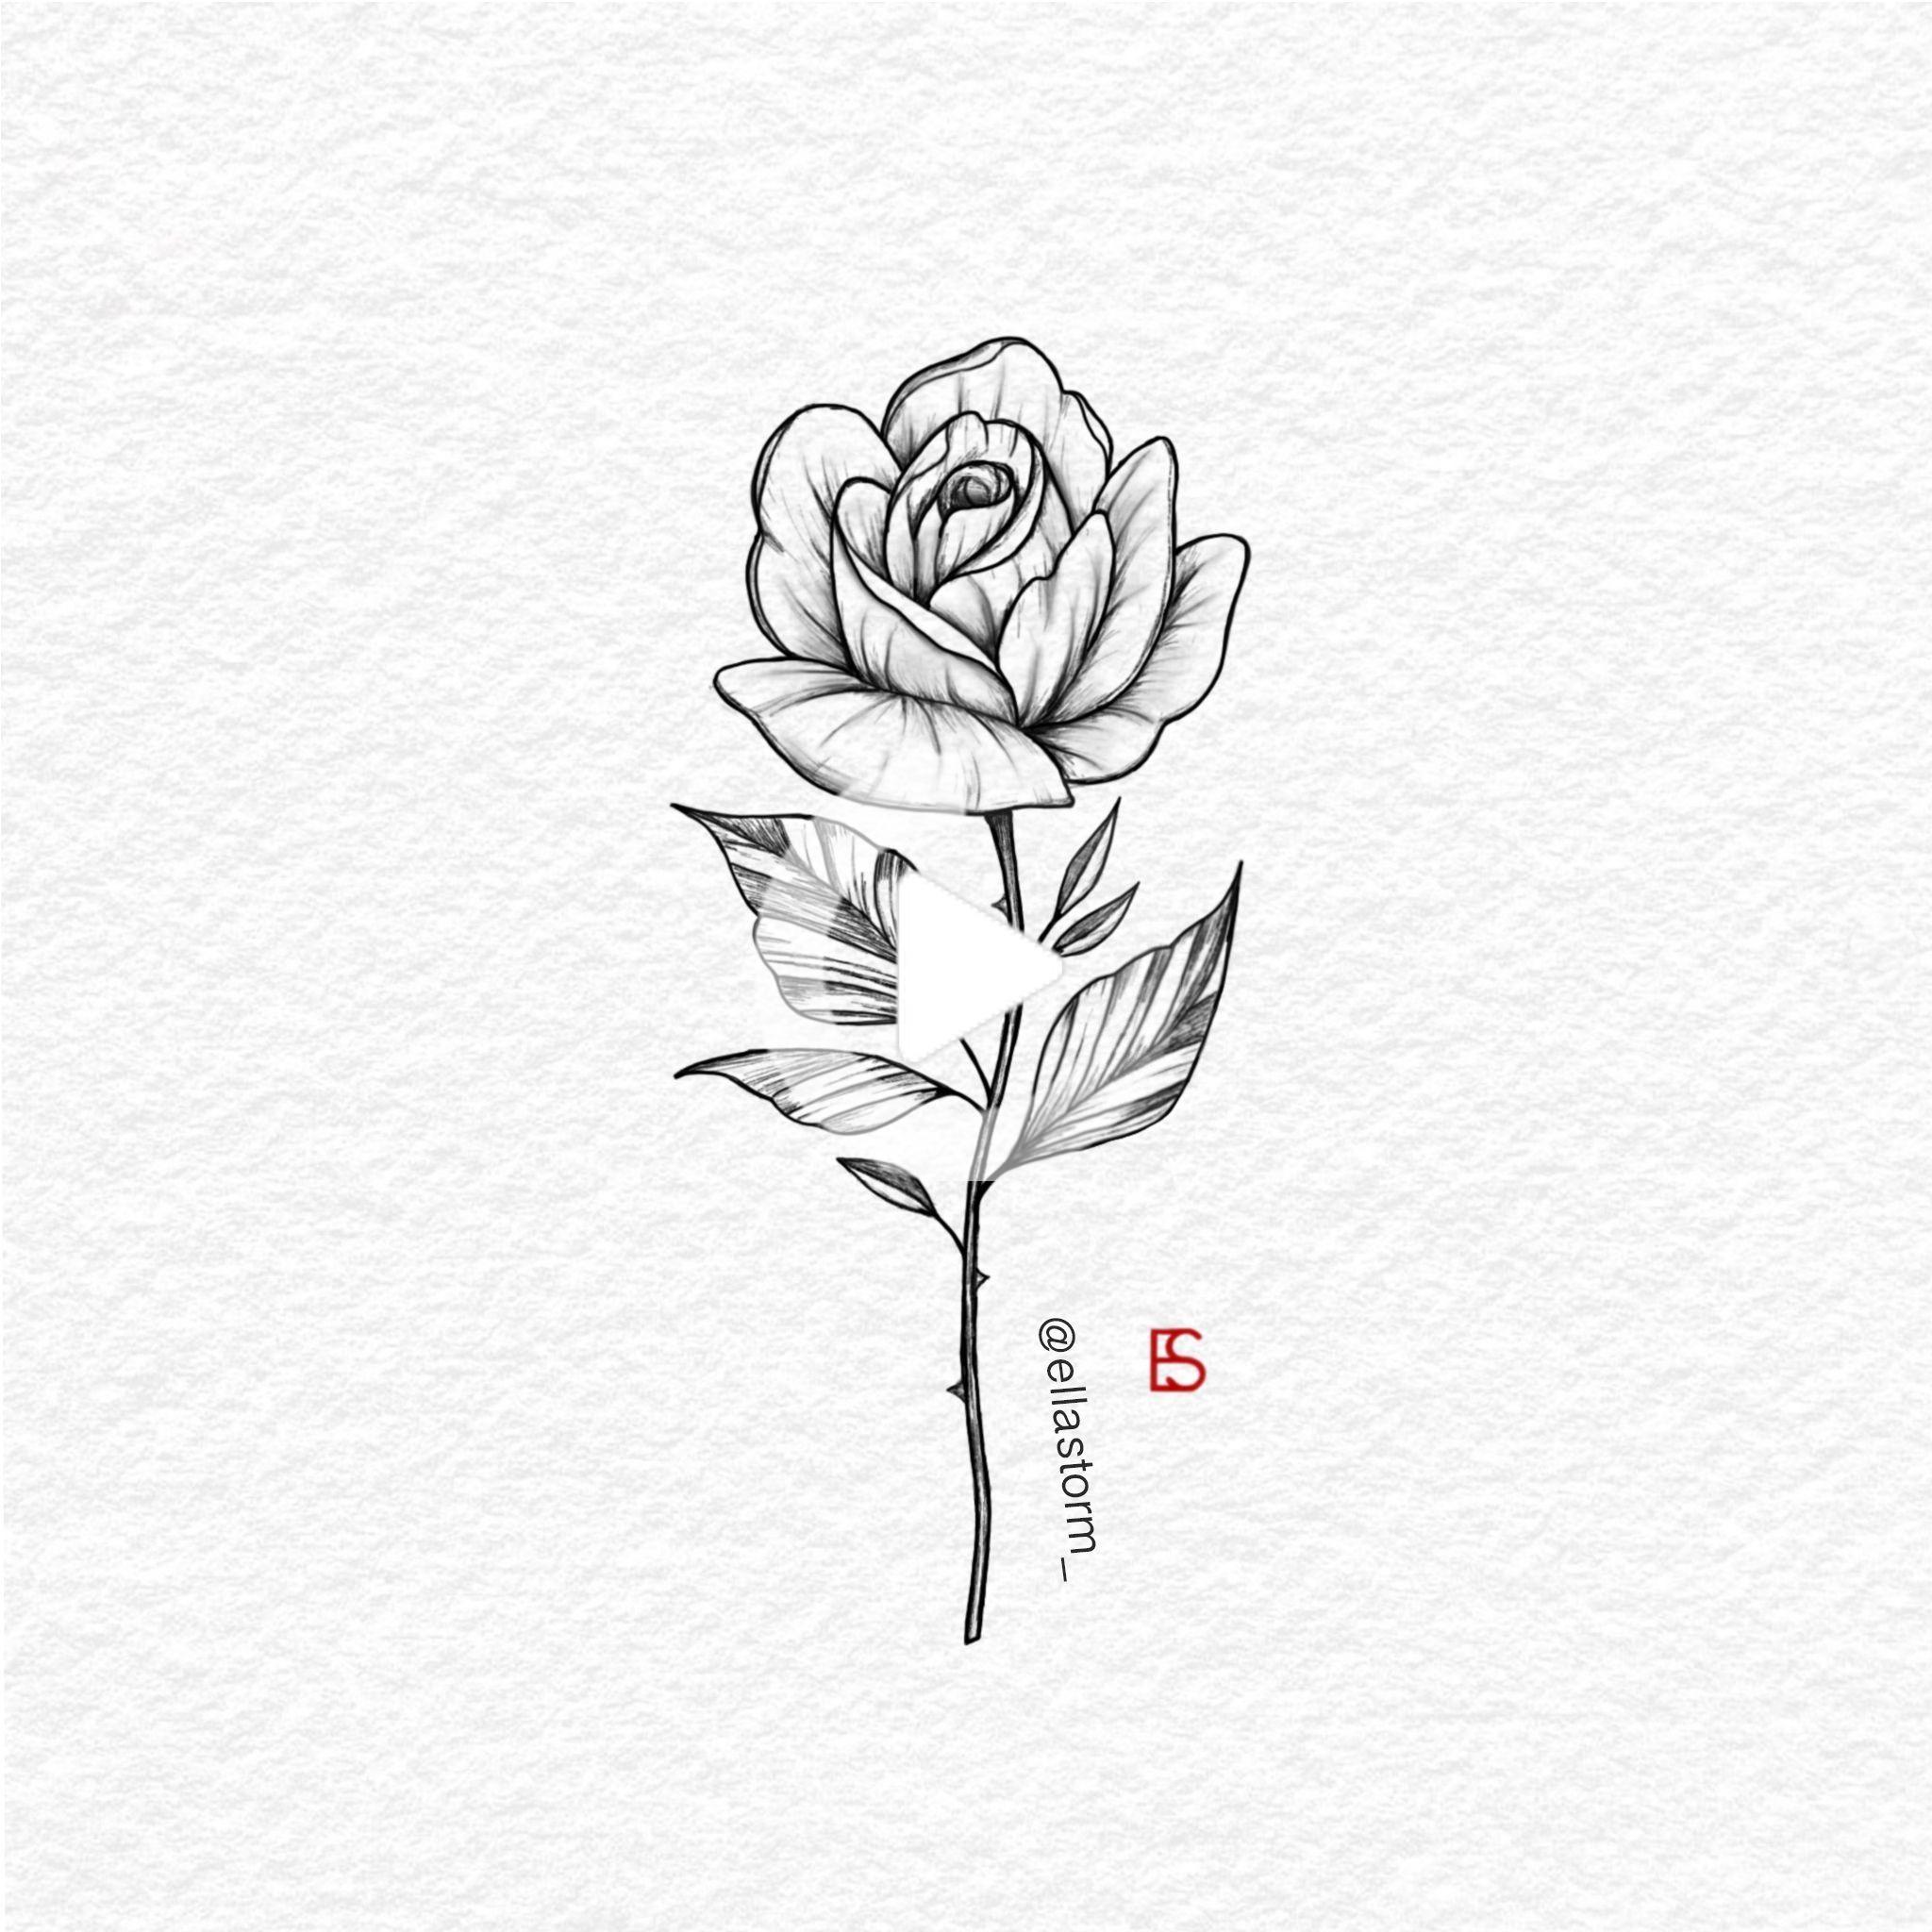 Single Rose Fine Line Tattoo Design By Ella Storm Ellastorm Tatuajes De Rosas Tatuaje Rosa Pequena Tatuaje De Oreja